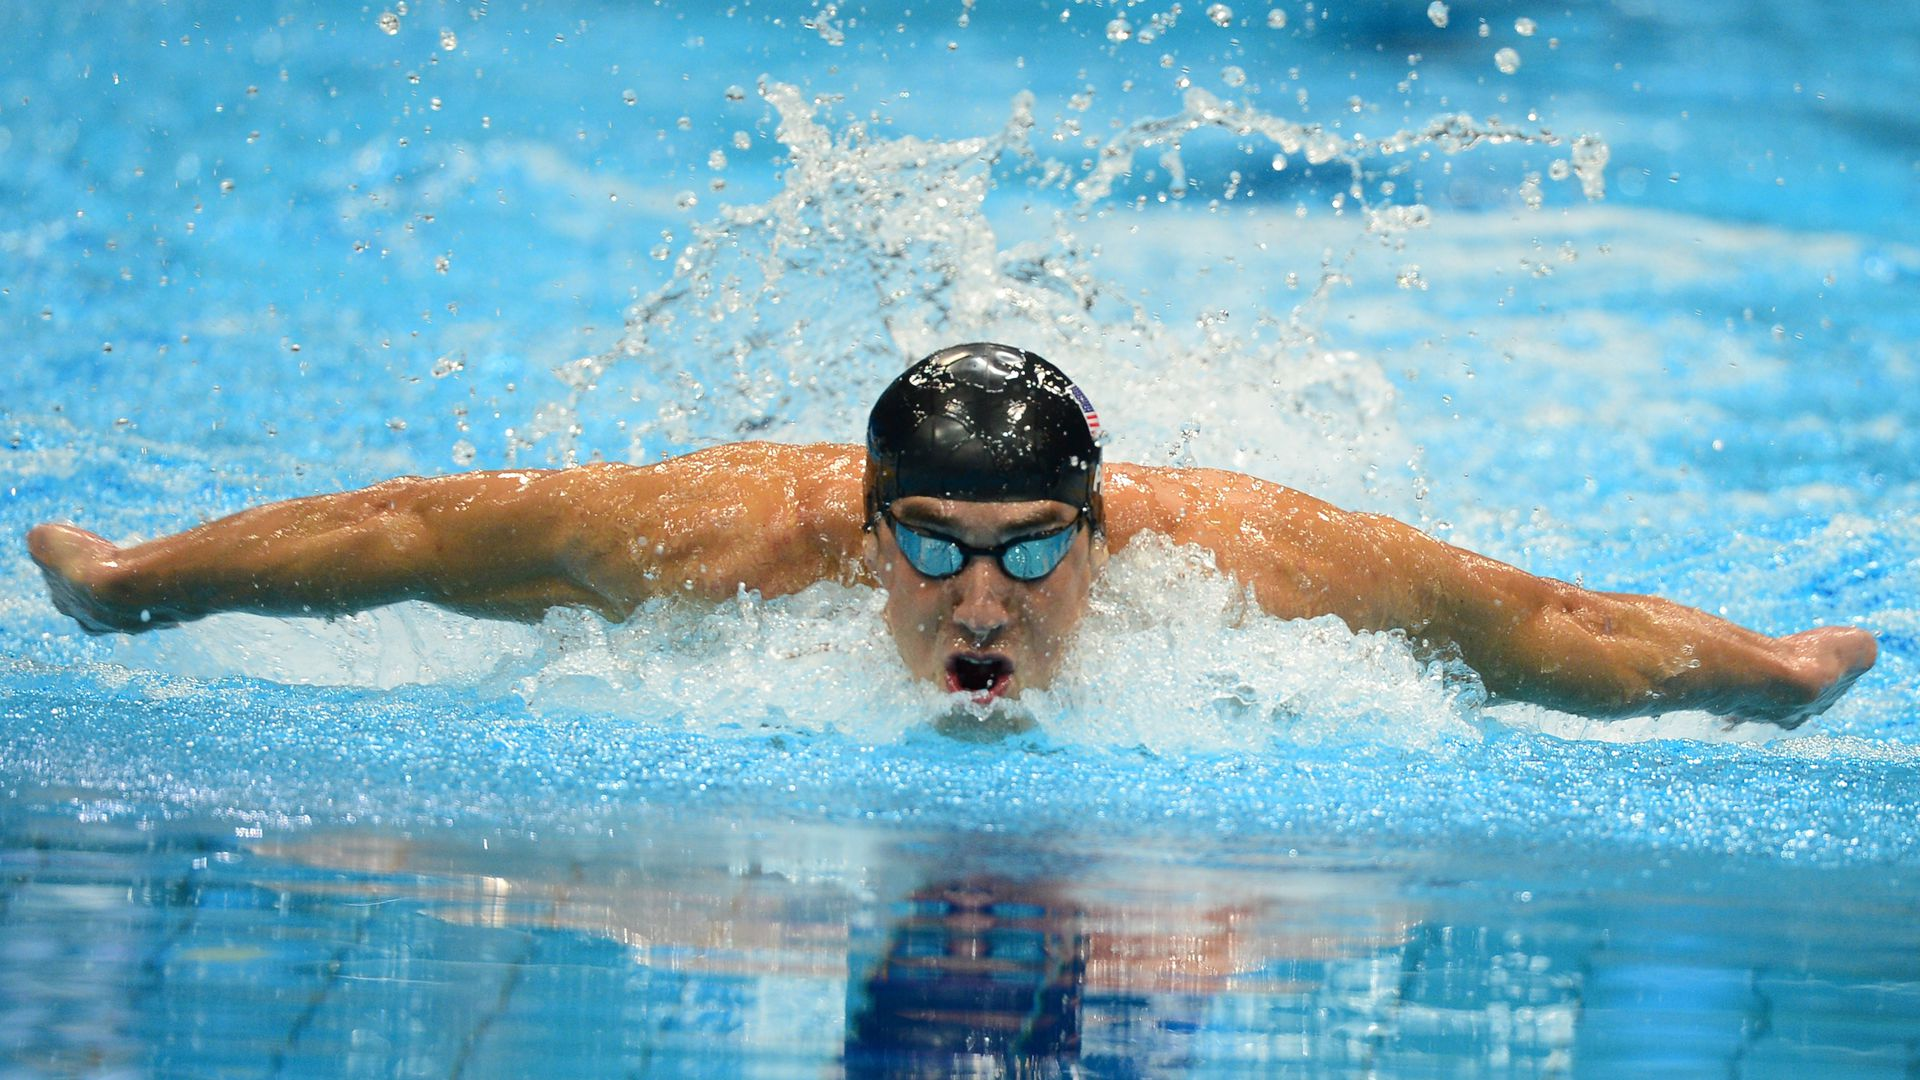 6. Aug. 2, 2012: 🏊♂️ Phelps makes history